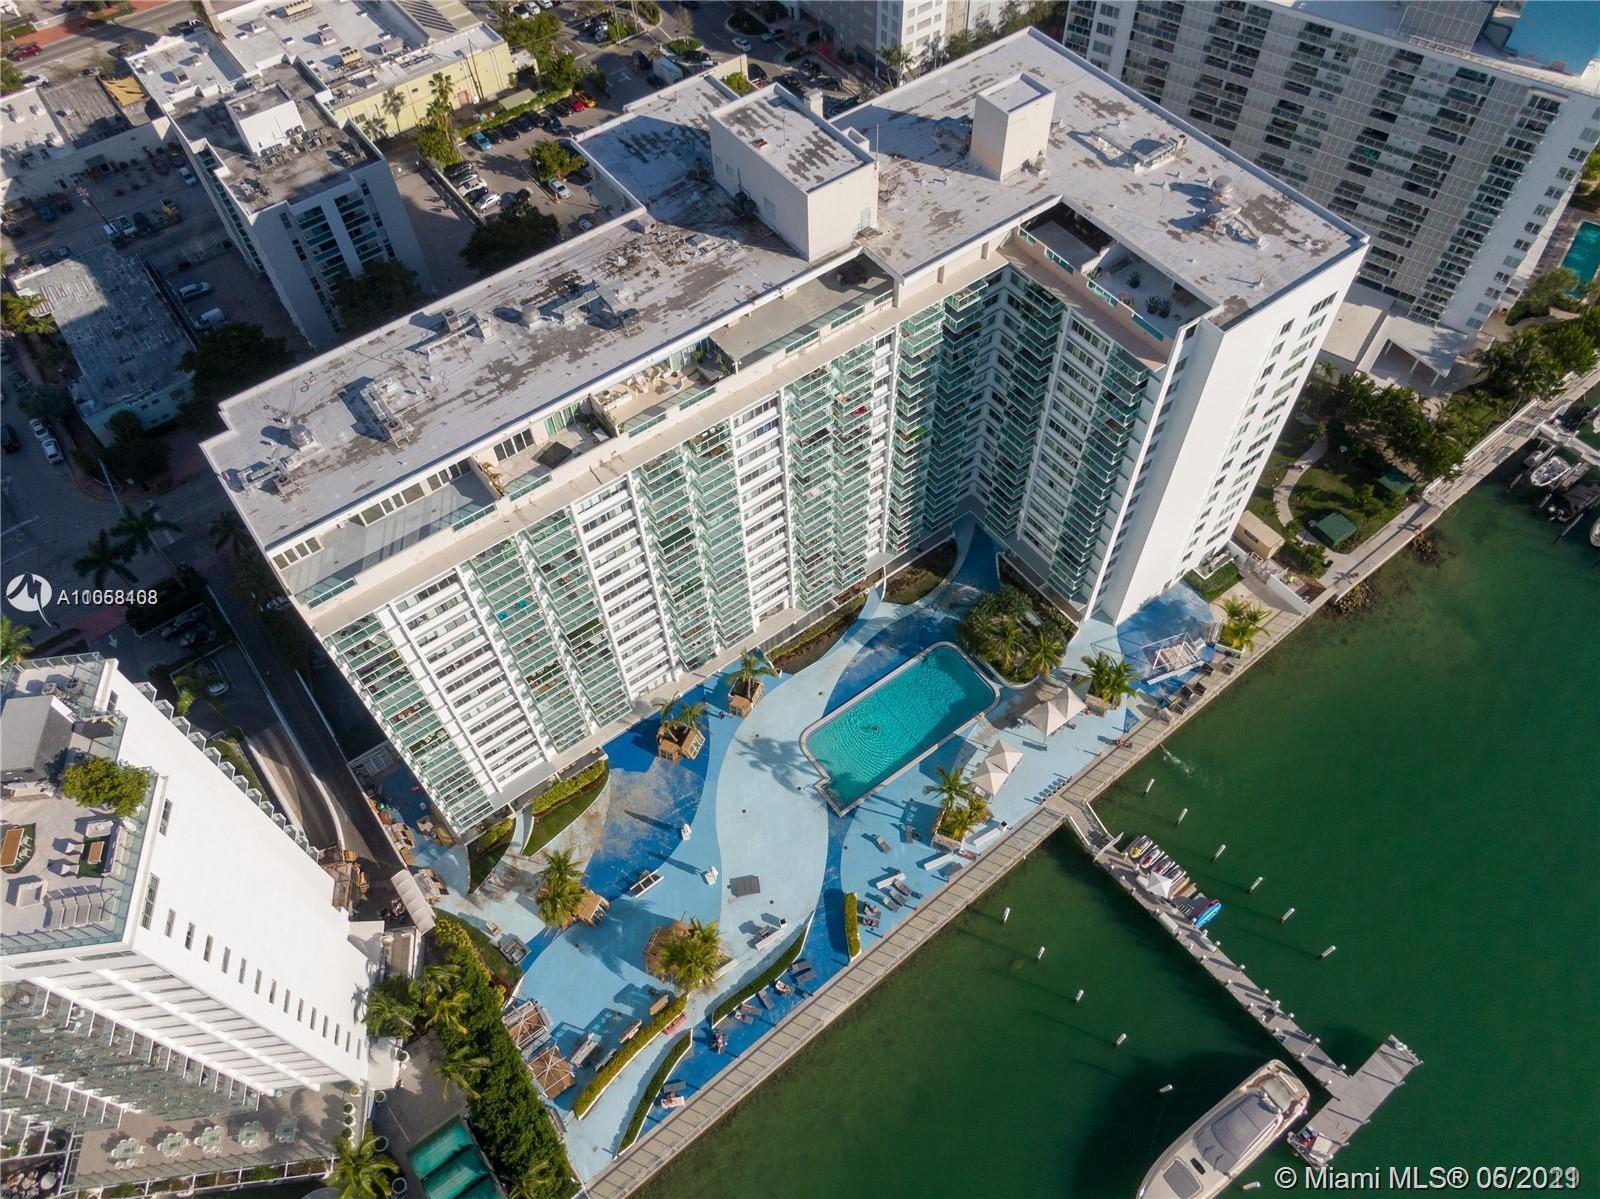 Mirador South #203 - 1000 West Ave #203, Miami Beach, FL 33139